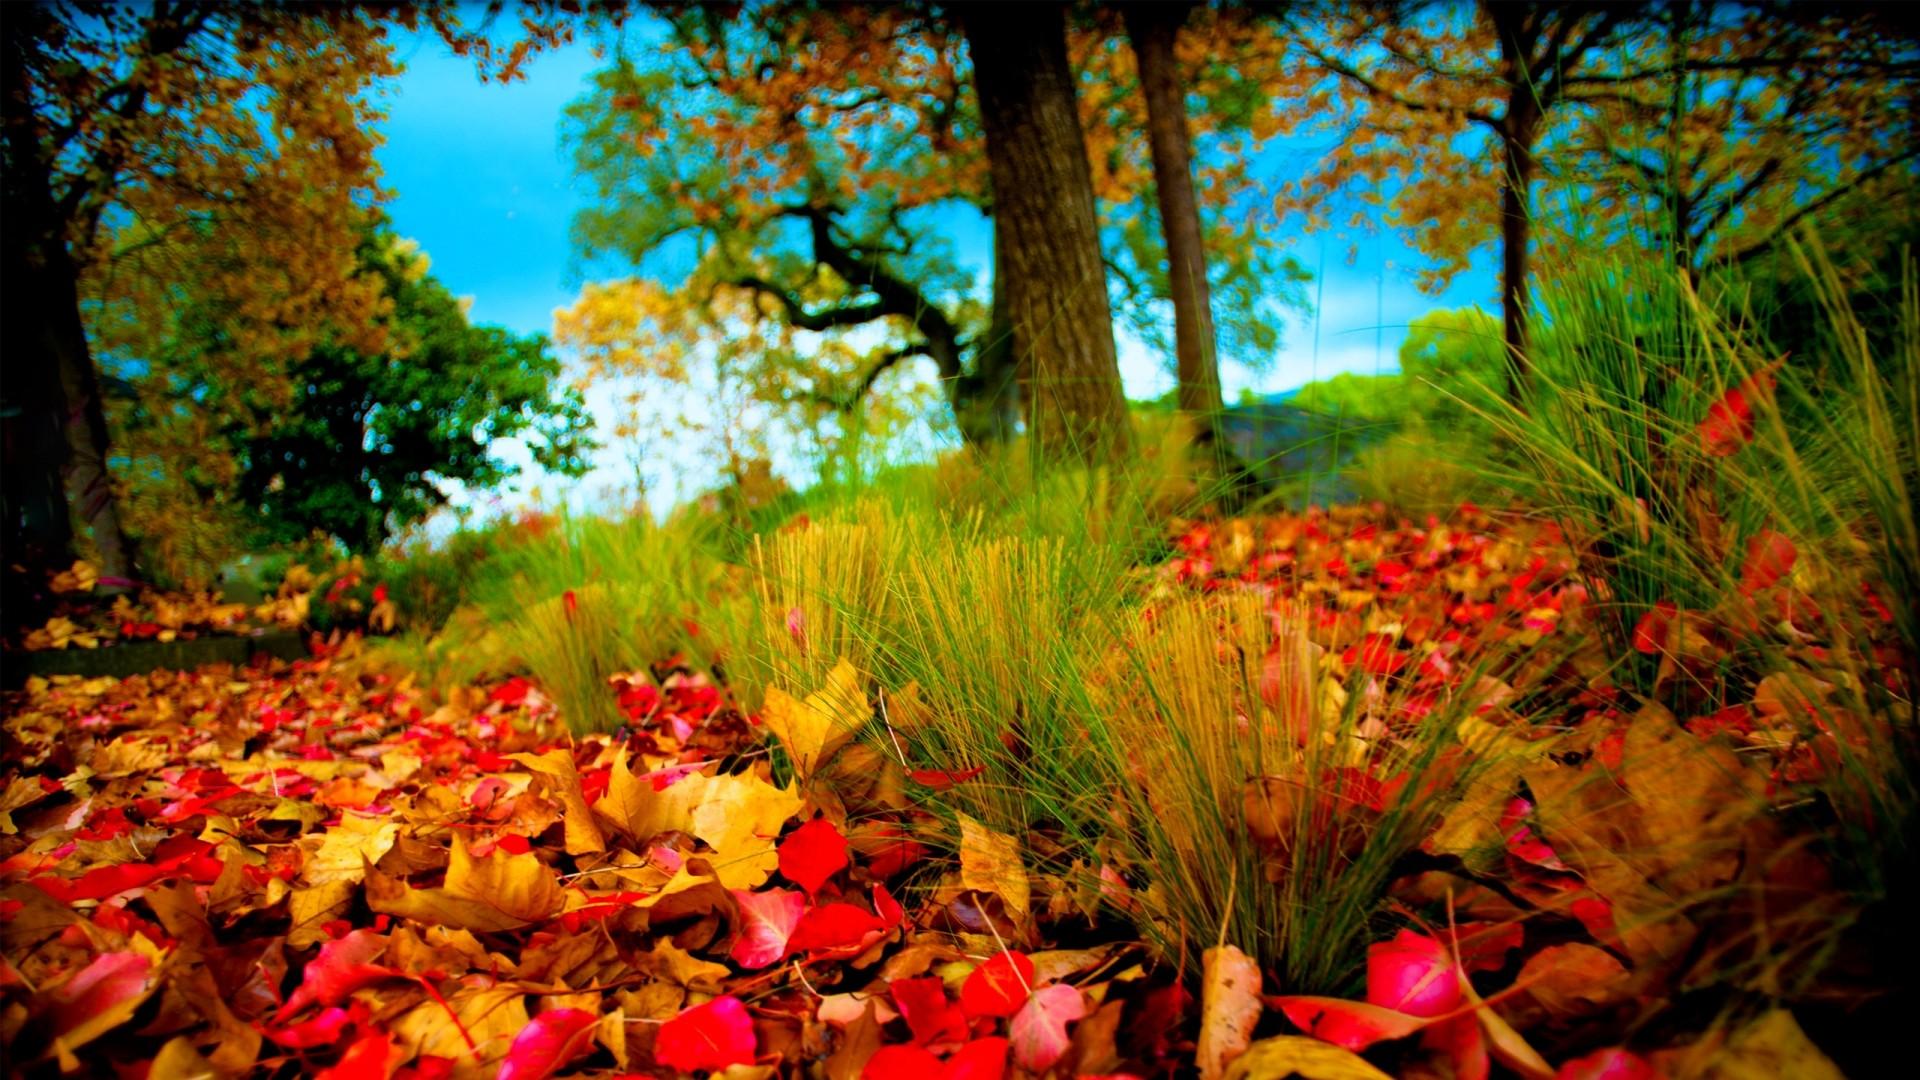 fall-leaves-images-hd-wallpaper-1080p1.jpg (1920×1080)   Wallpapers HD    Pinterest   Hd wallpaper and Wallpaper